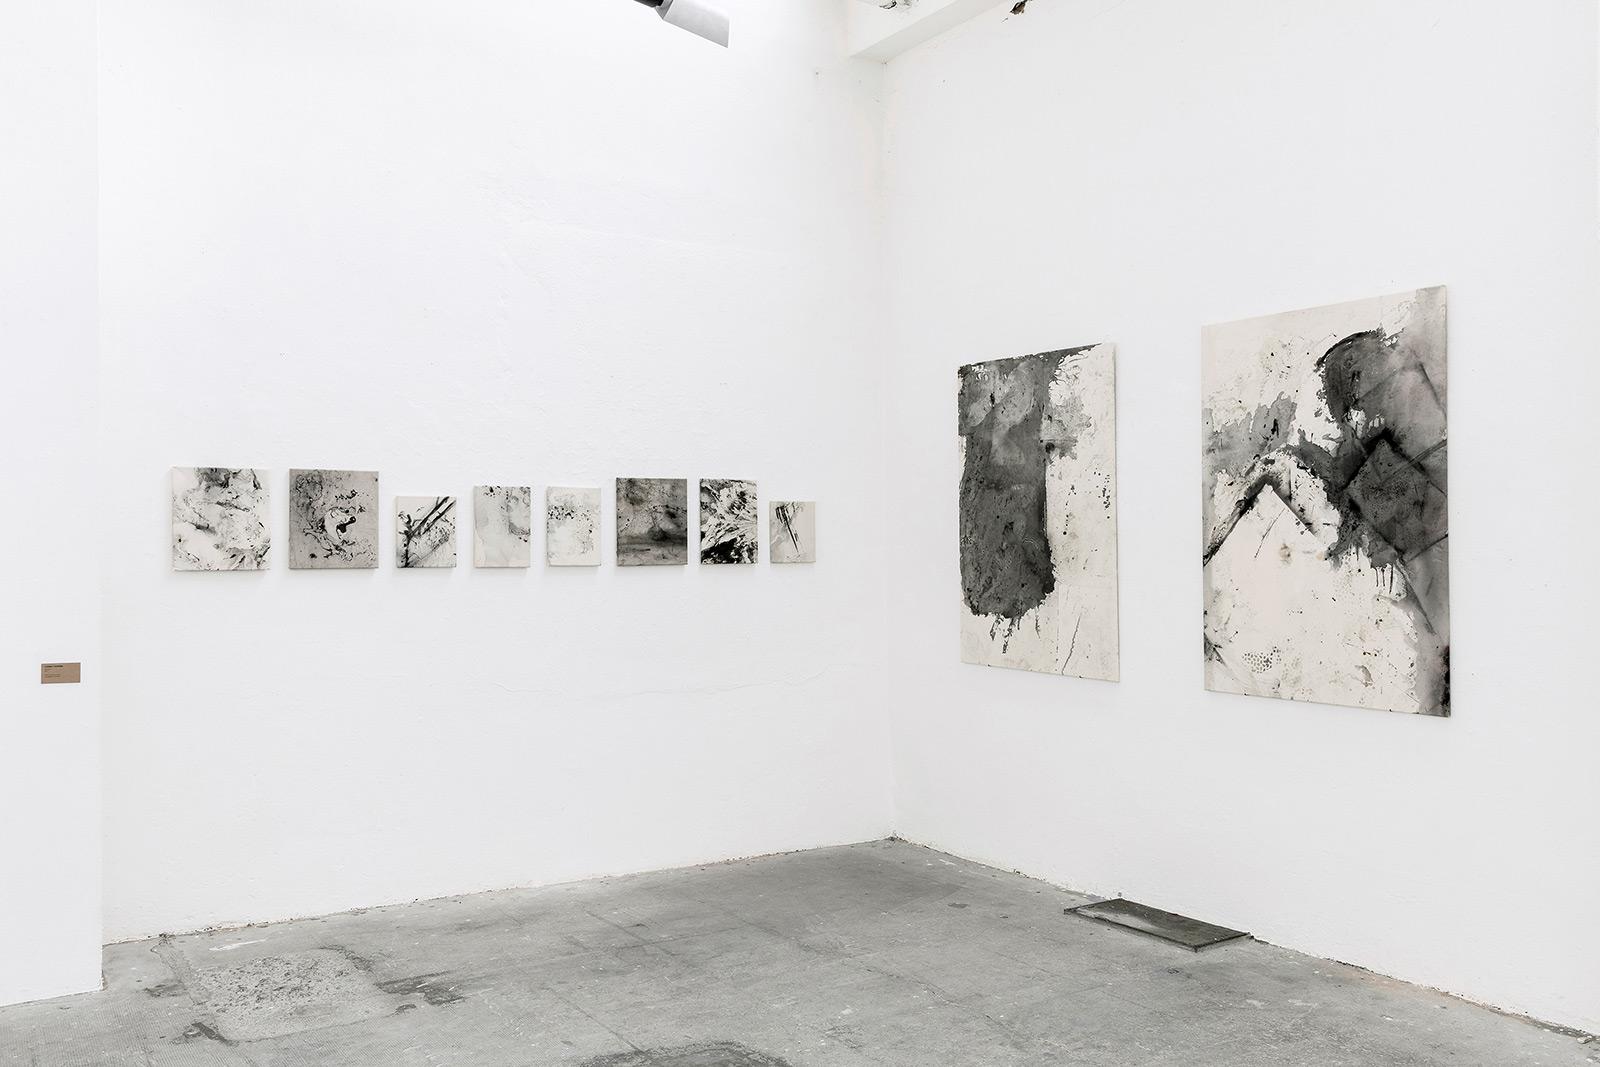 Corina Thommen – Spuren I, II, III